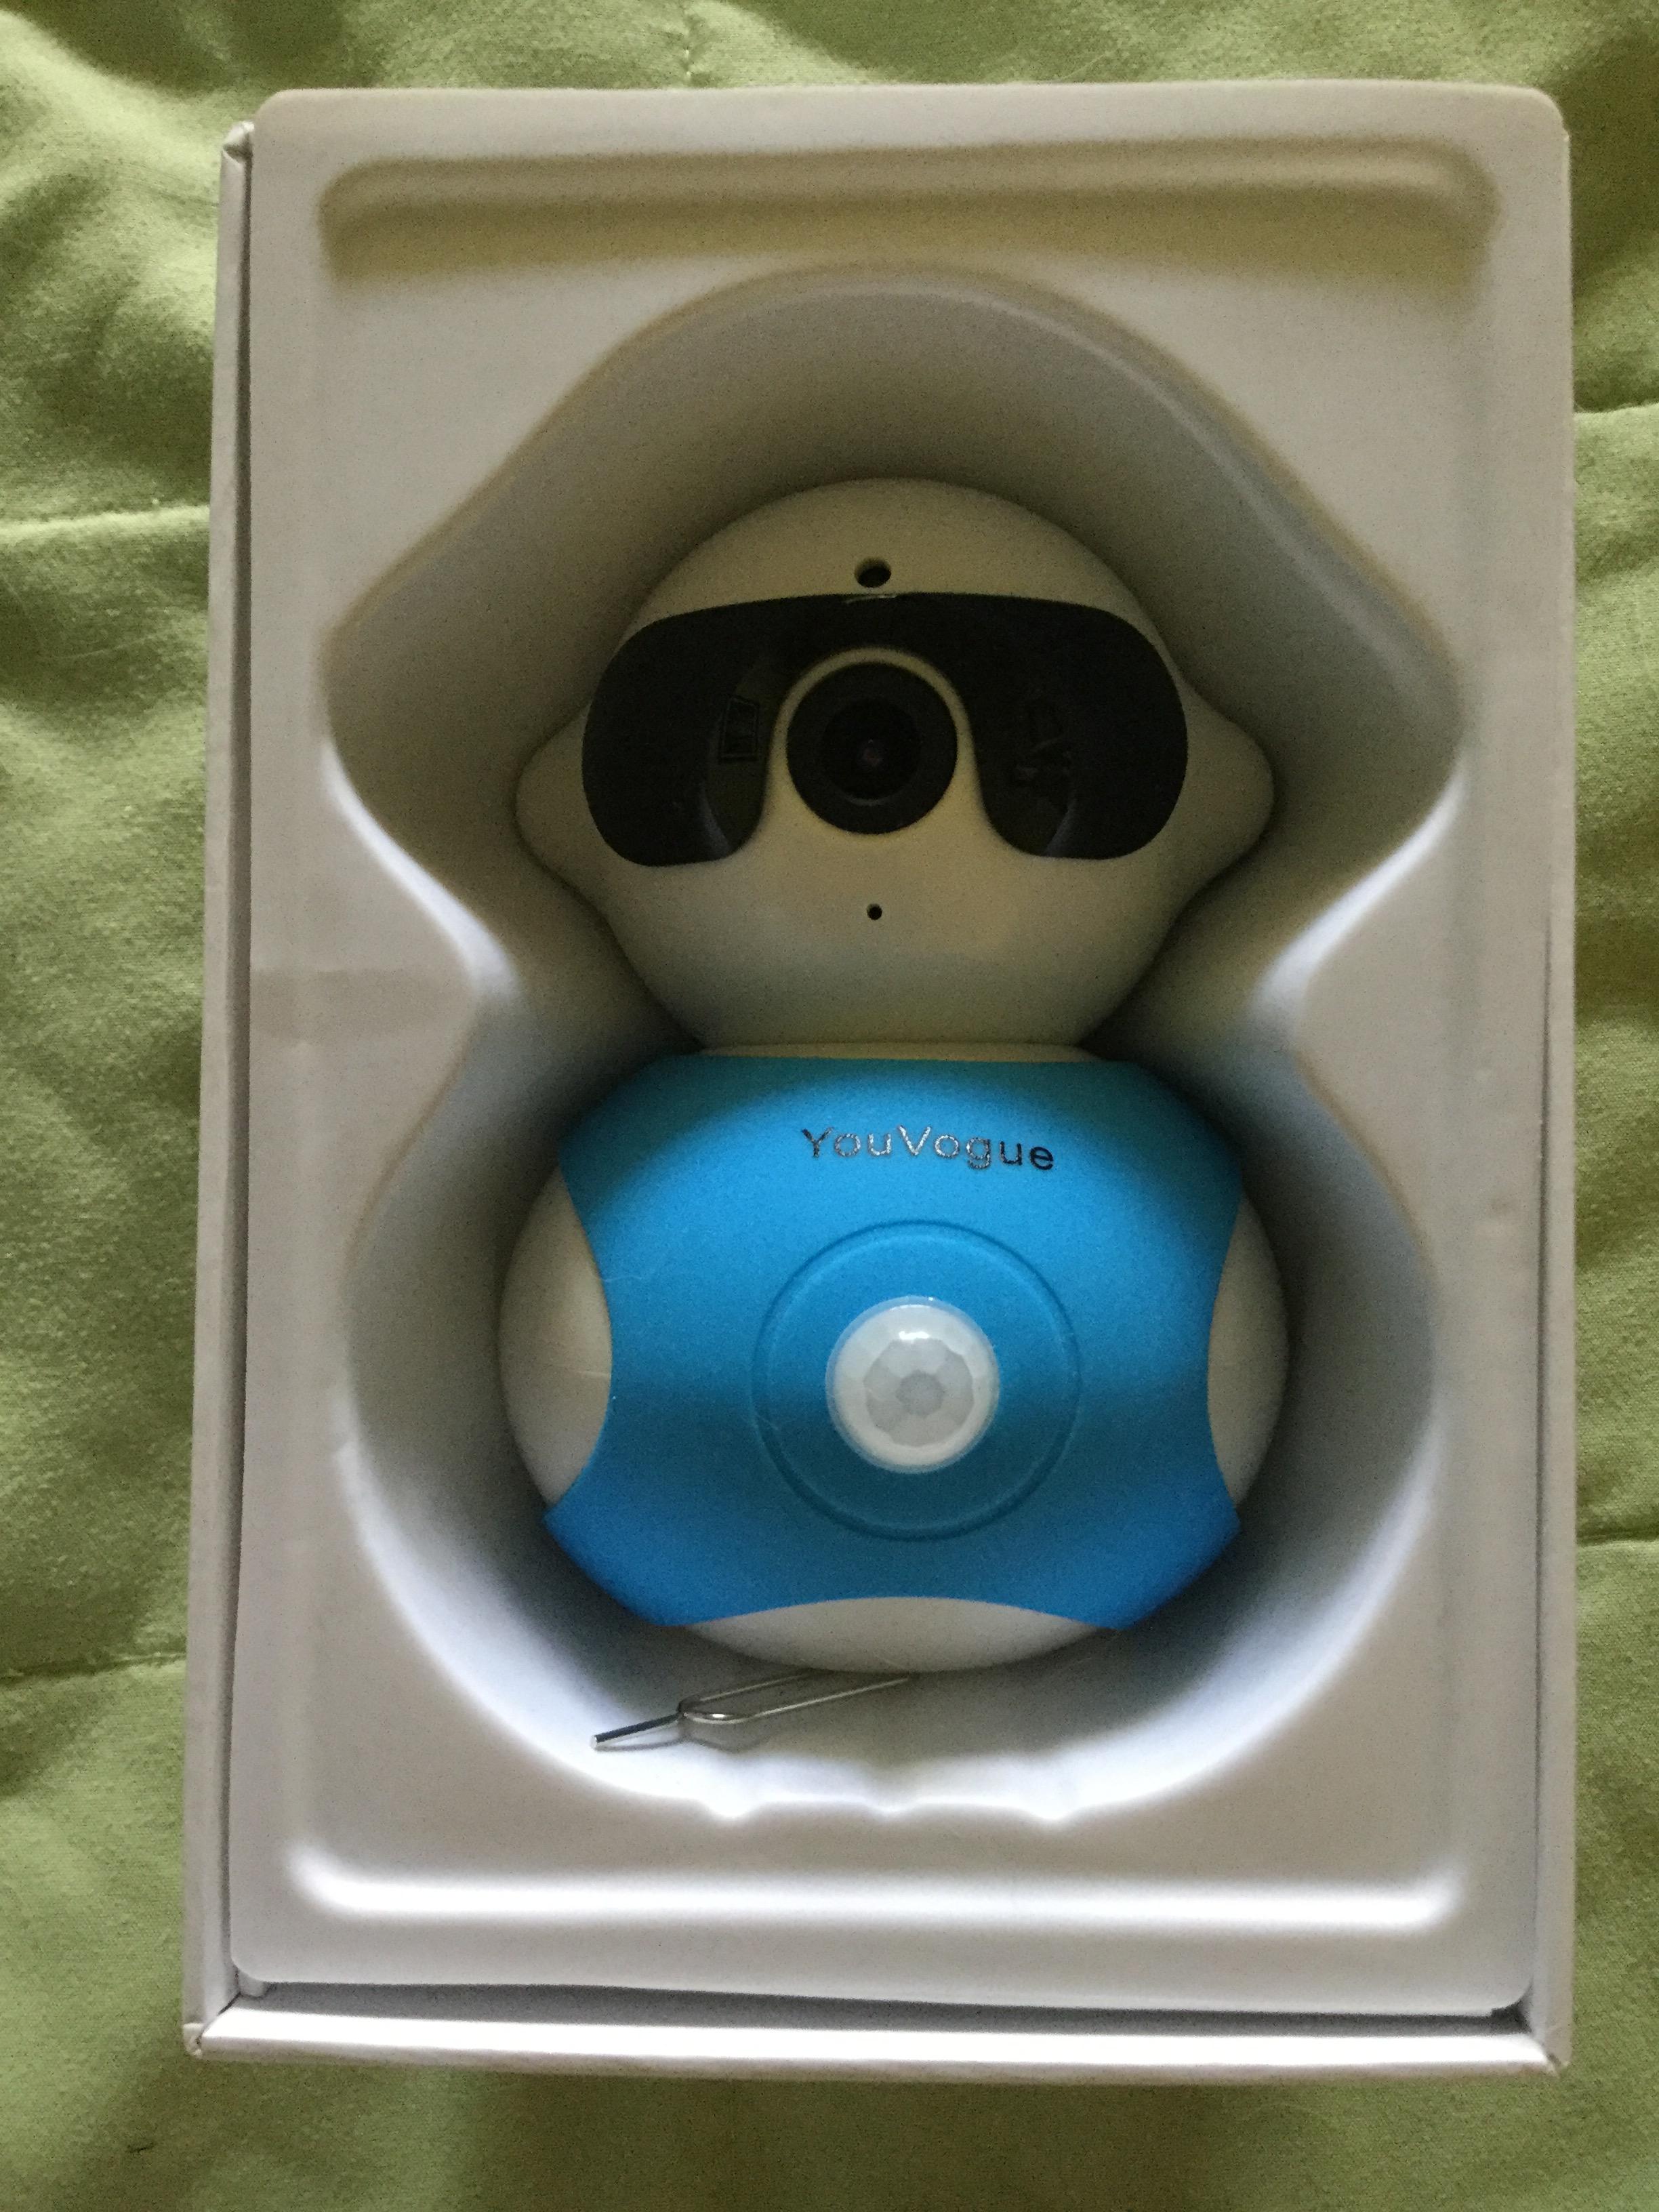 Youvogue Dual Hd 960p Wireless Ip Camera And Robot Shape